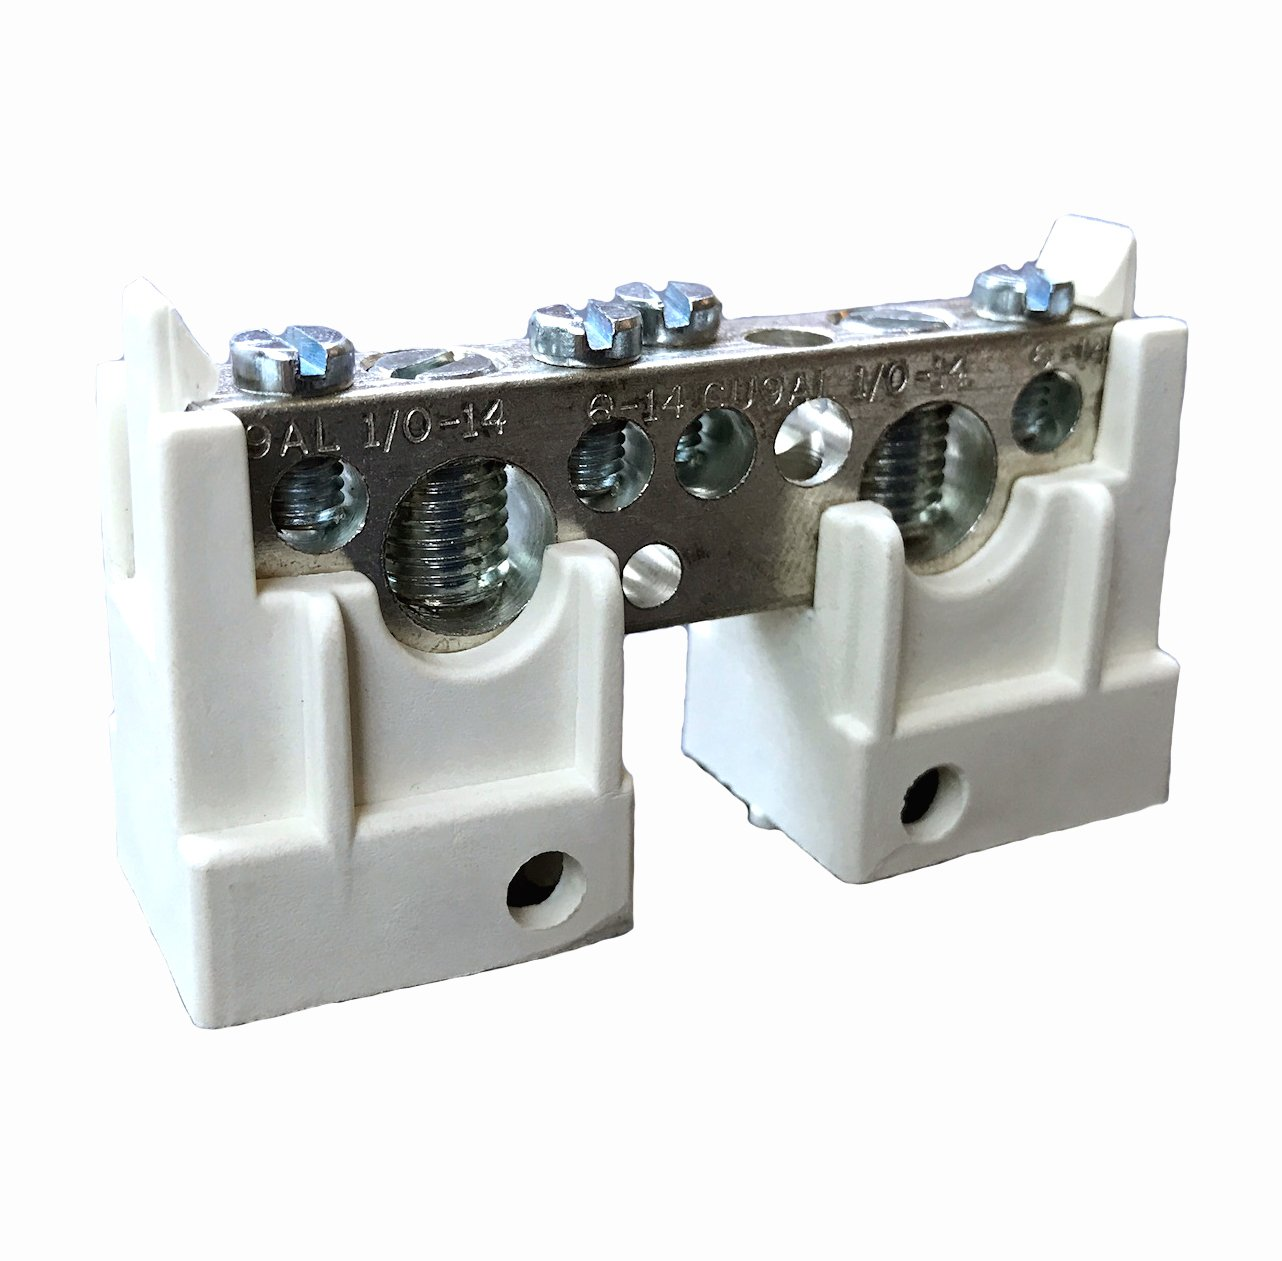 sikiwind 2pcs DC 48V Bus Bar M10 Heavy Duty Positive Power Distribution Studs Terminal Blocks